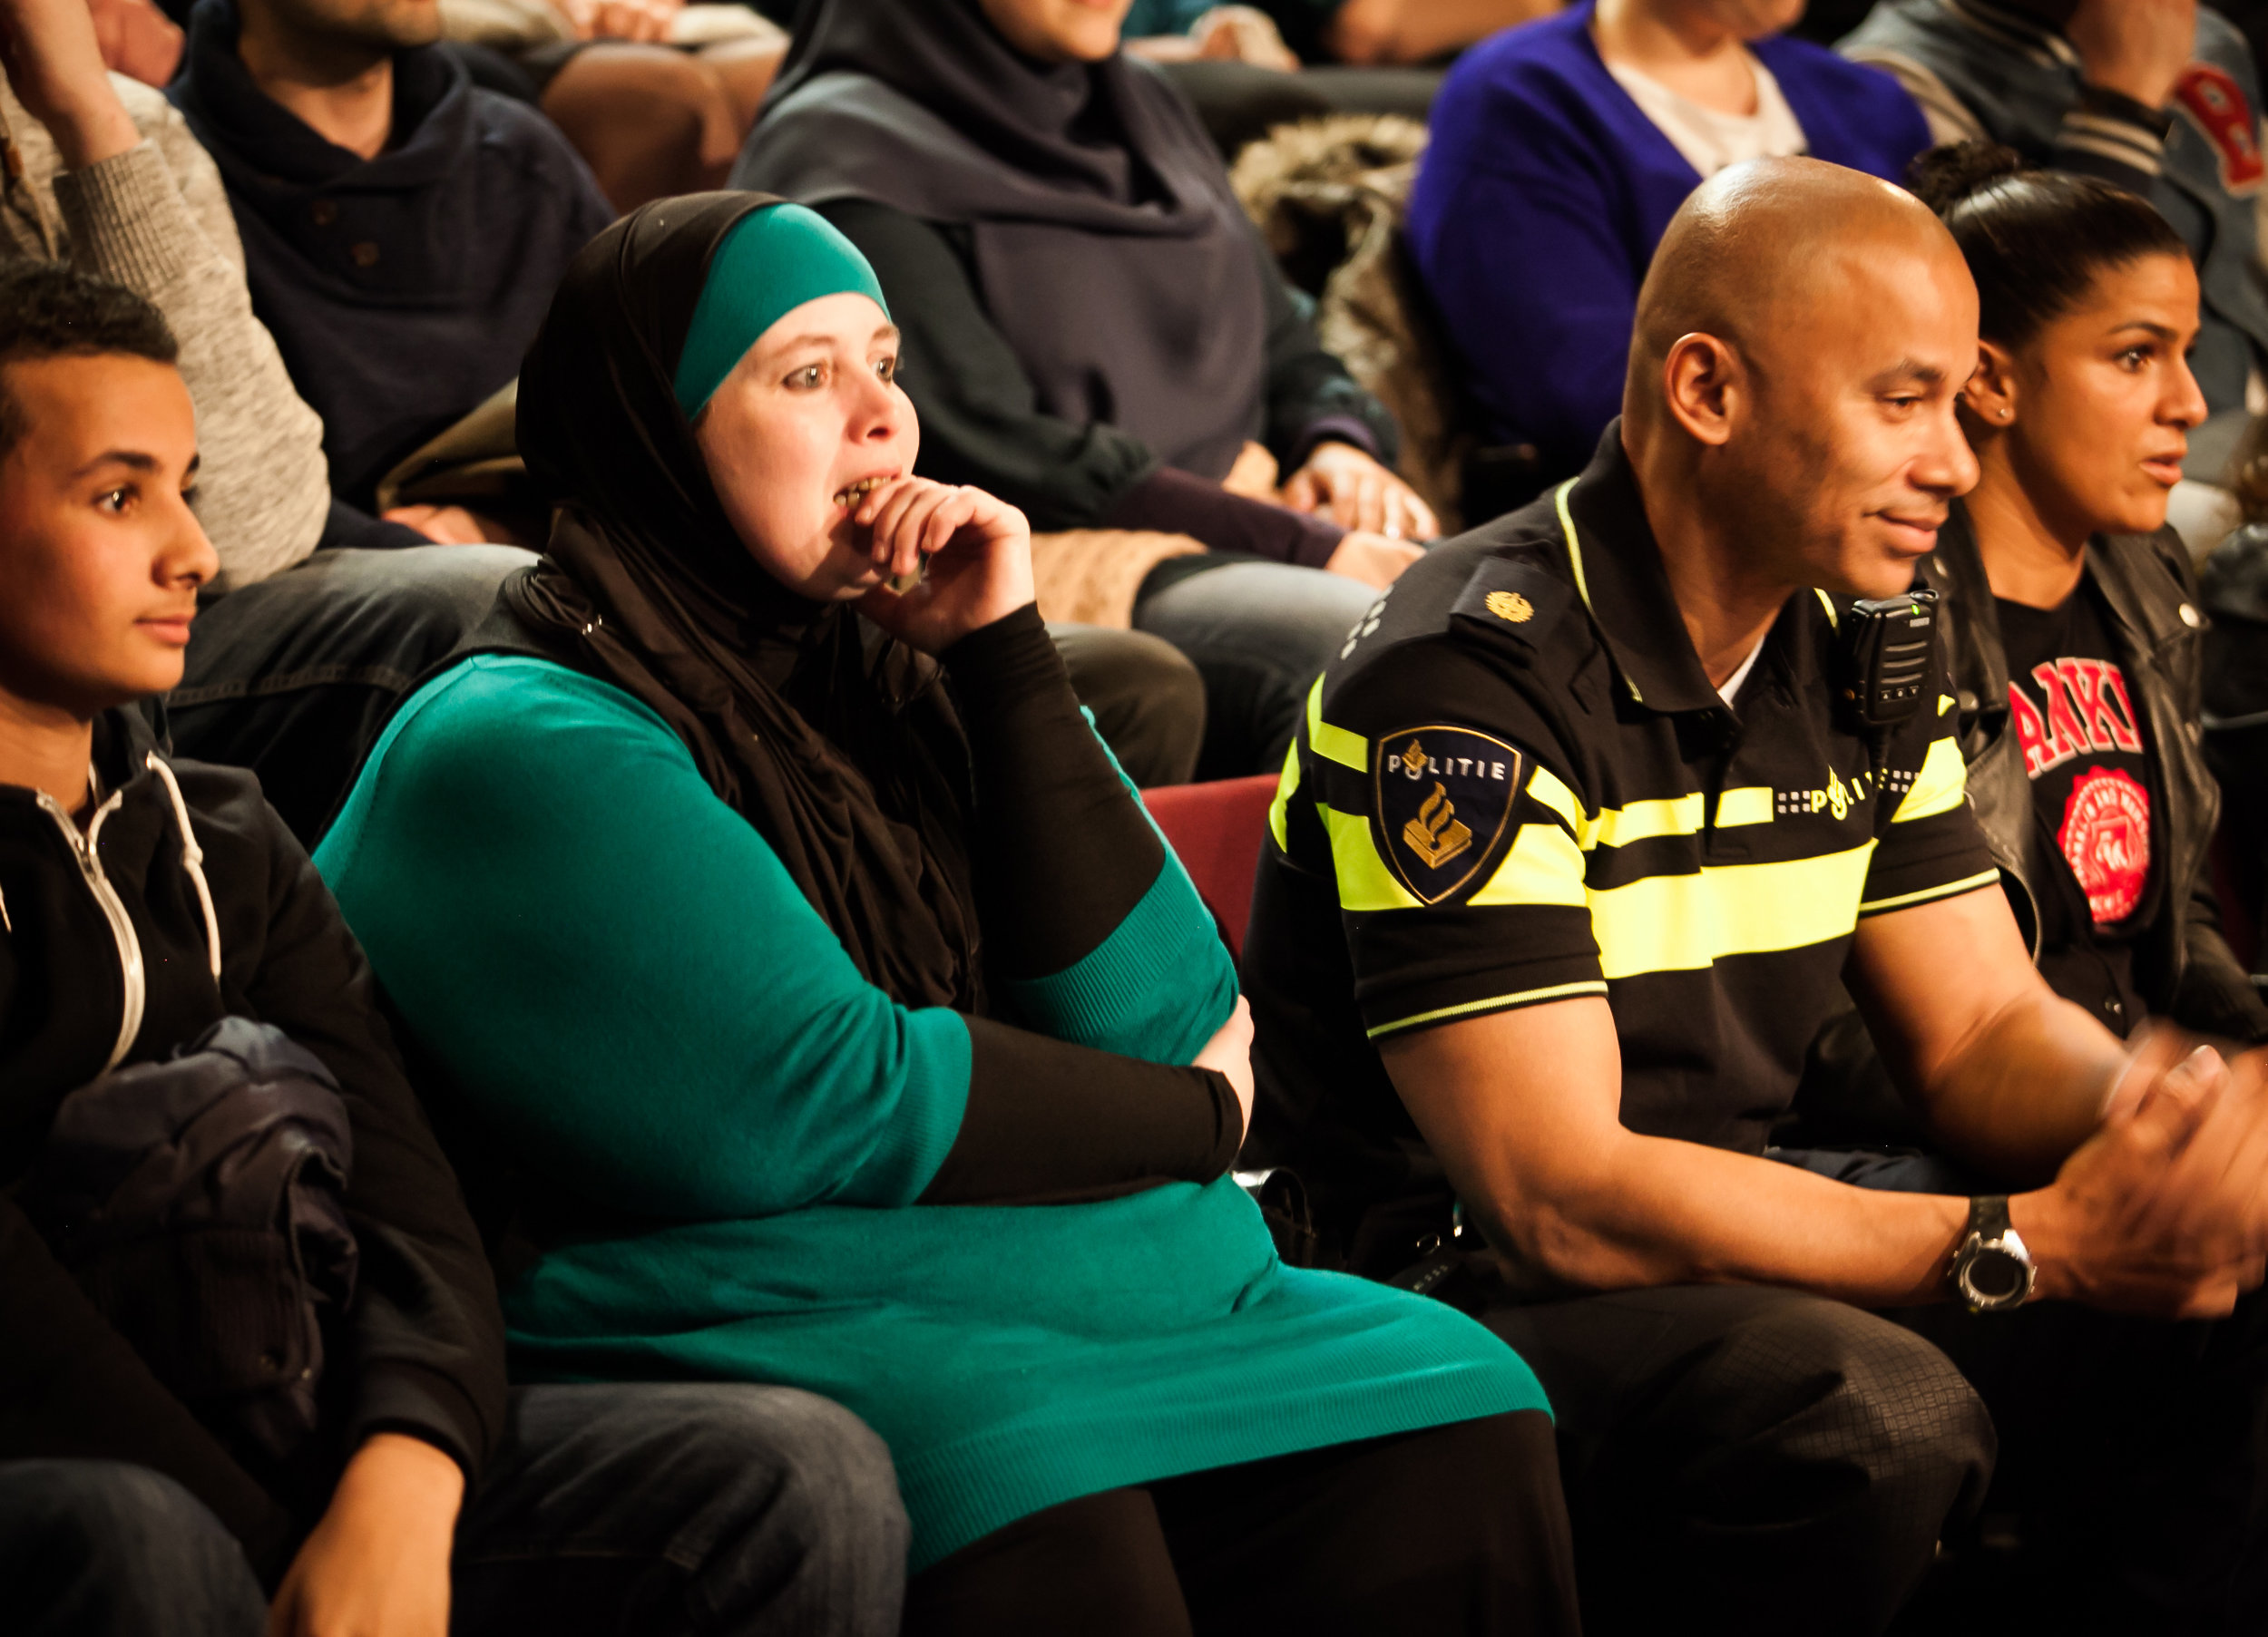 www.creasies.nl izisolutions ctrl alt delete010-0297.jpg